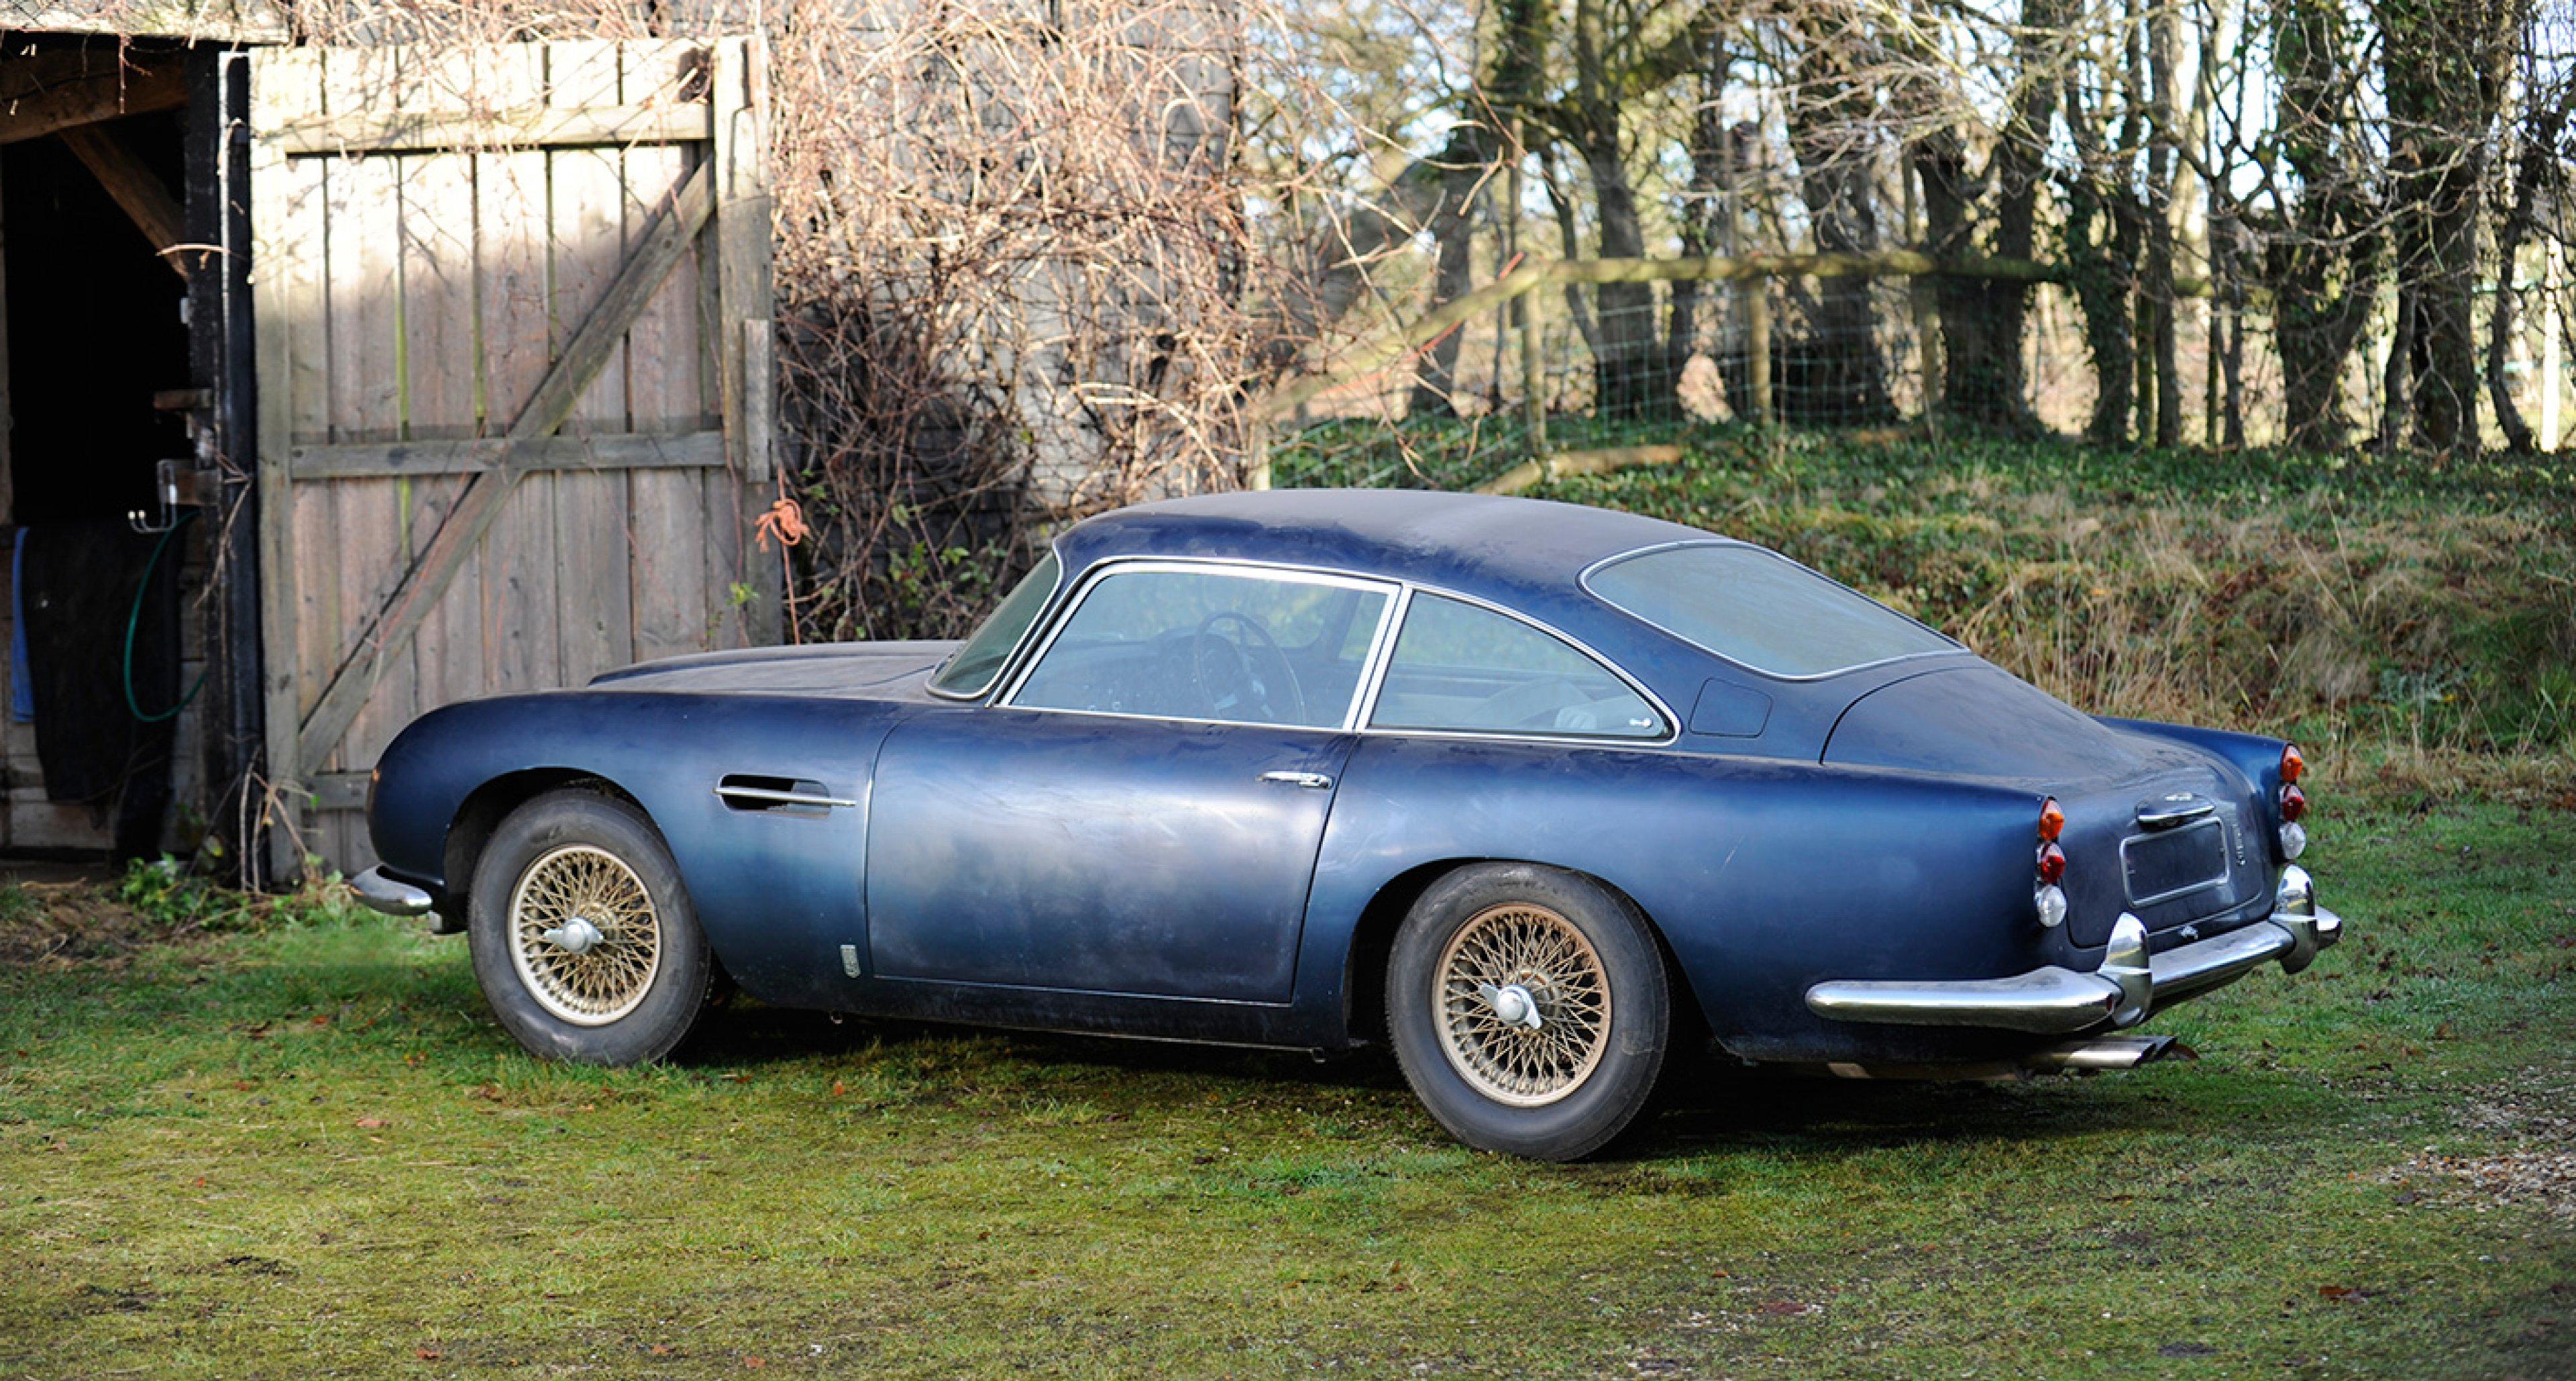 1964 Aston Martin DB5 Sports Saloon sold by Bonhams in 2013 for £320,700